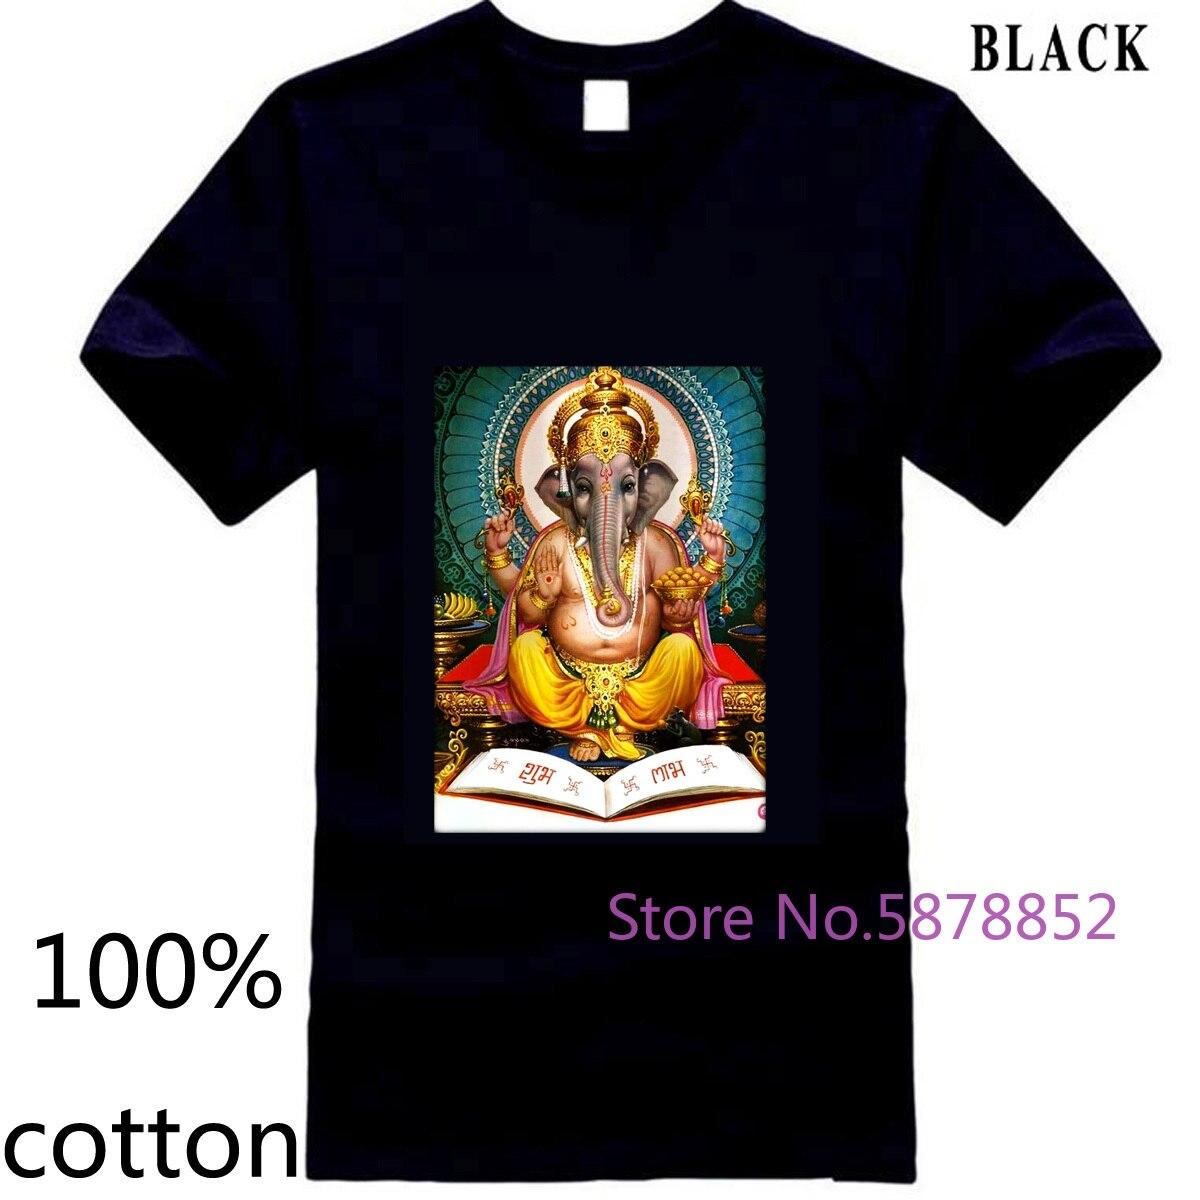 Ganesh Kali Shiva Krishna hinduismo yoga diosa meditación para hombres camiseta Normal para hombres camisetas tops 100% algodón